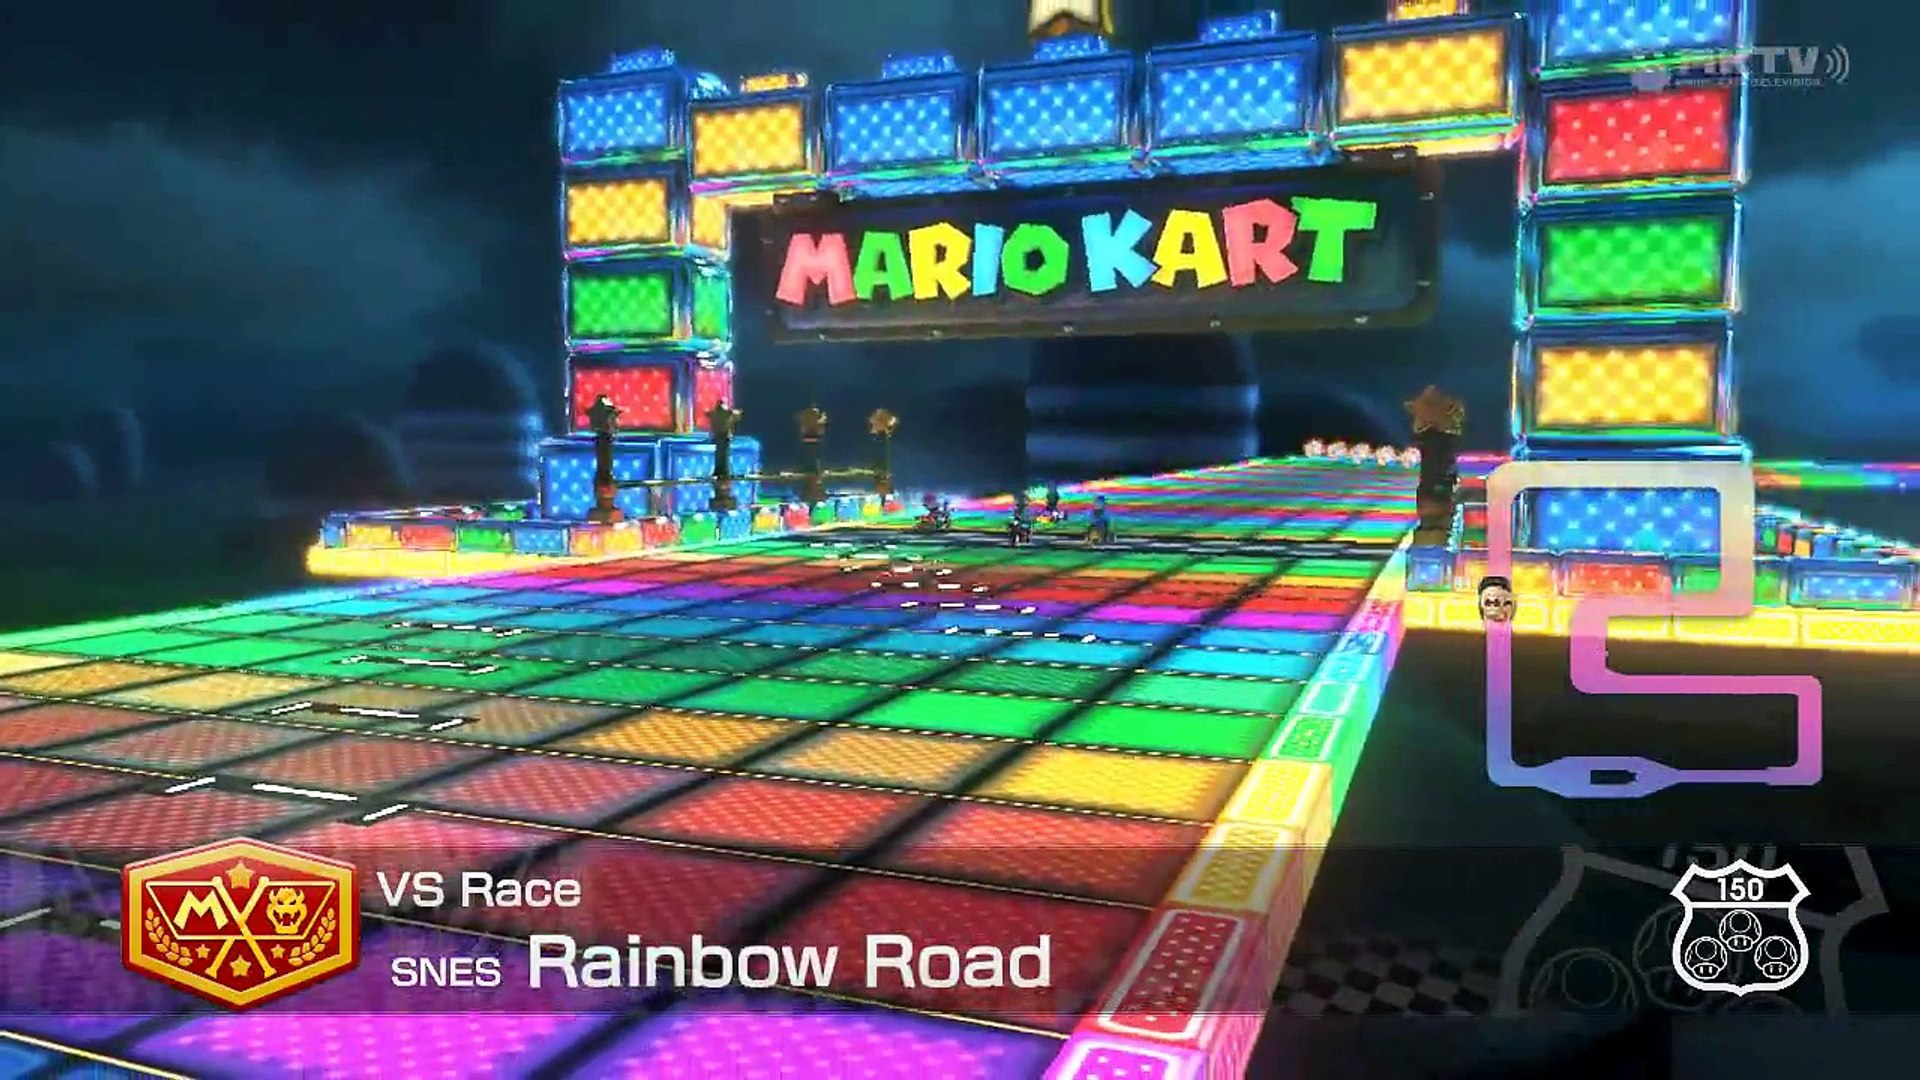 Wii U Mario Kart 8 Snes Rainbow Road Video Dailymotion